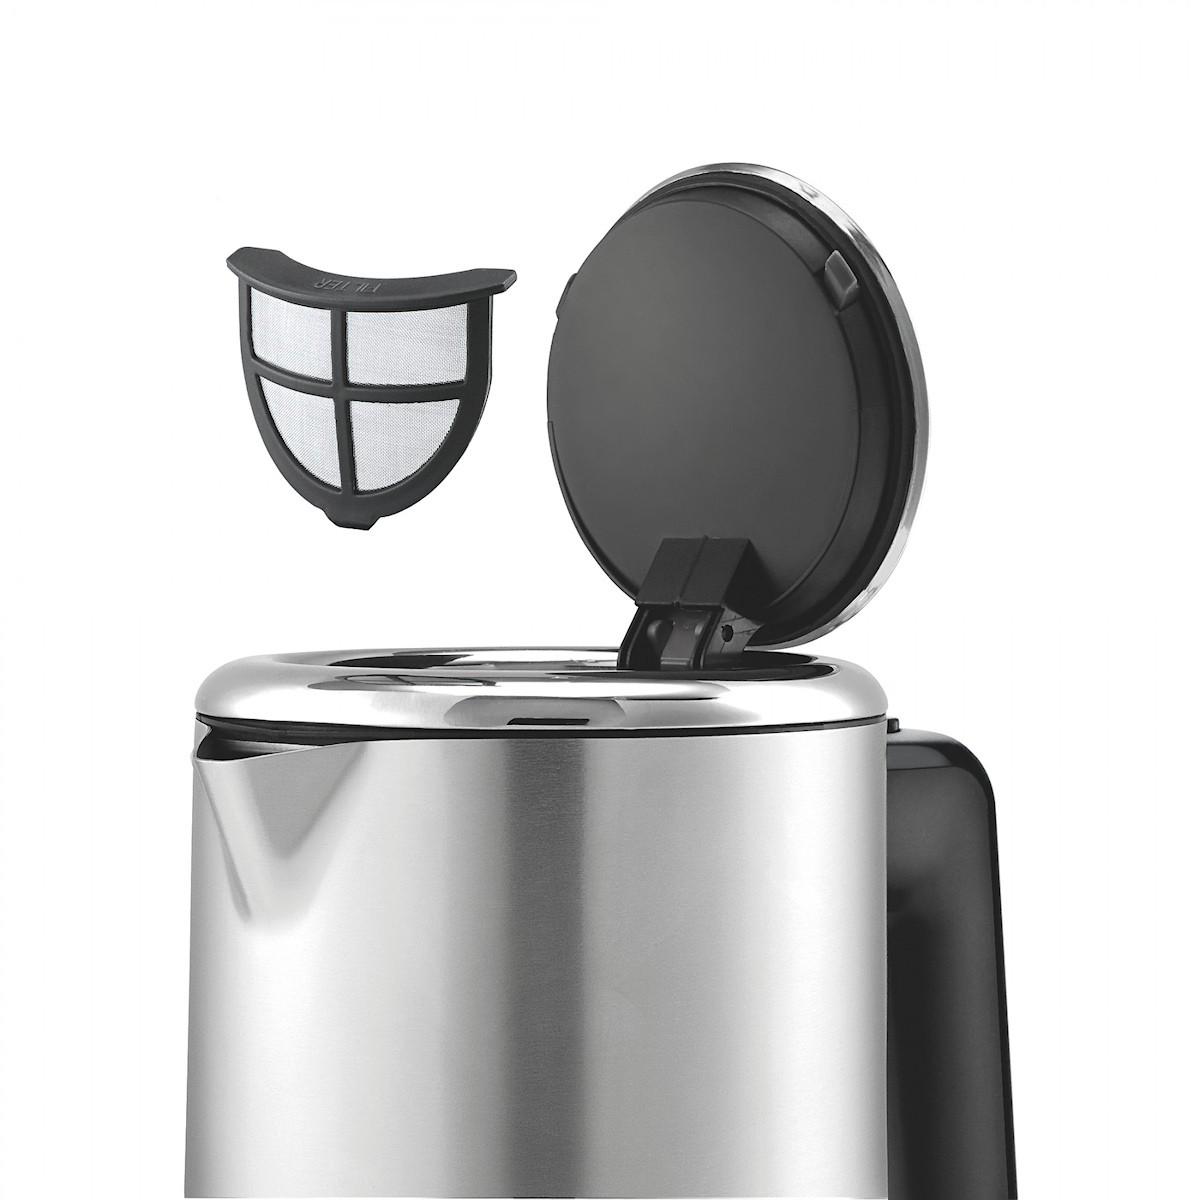 czajnik elektryczny wmf kuchnia minis 0413140011 sklep. Black Bedroom Furniture Sets. Home Design Ideas